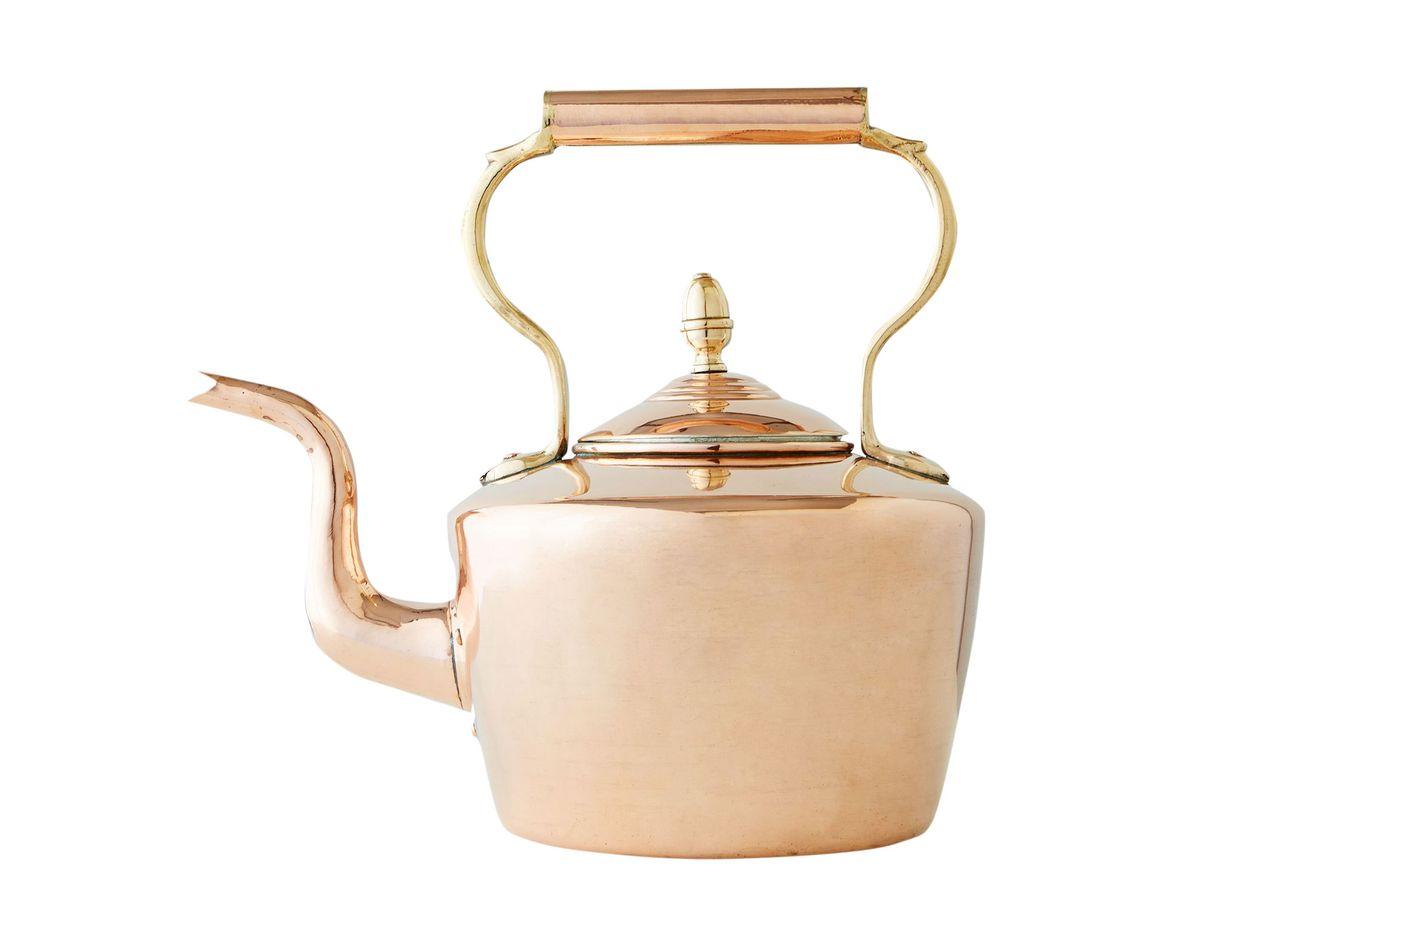 Coppermill Kitchen Vintage Copper Large Round English Tea Kettle